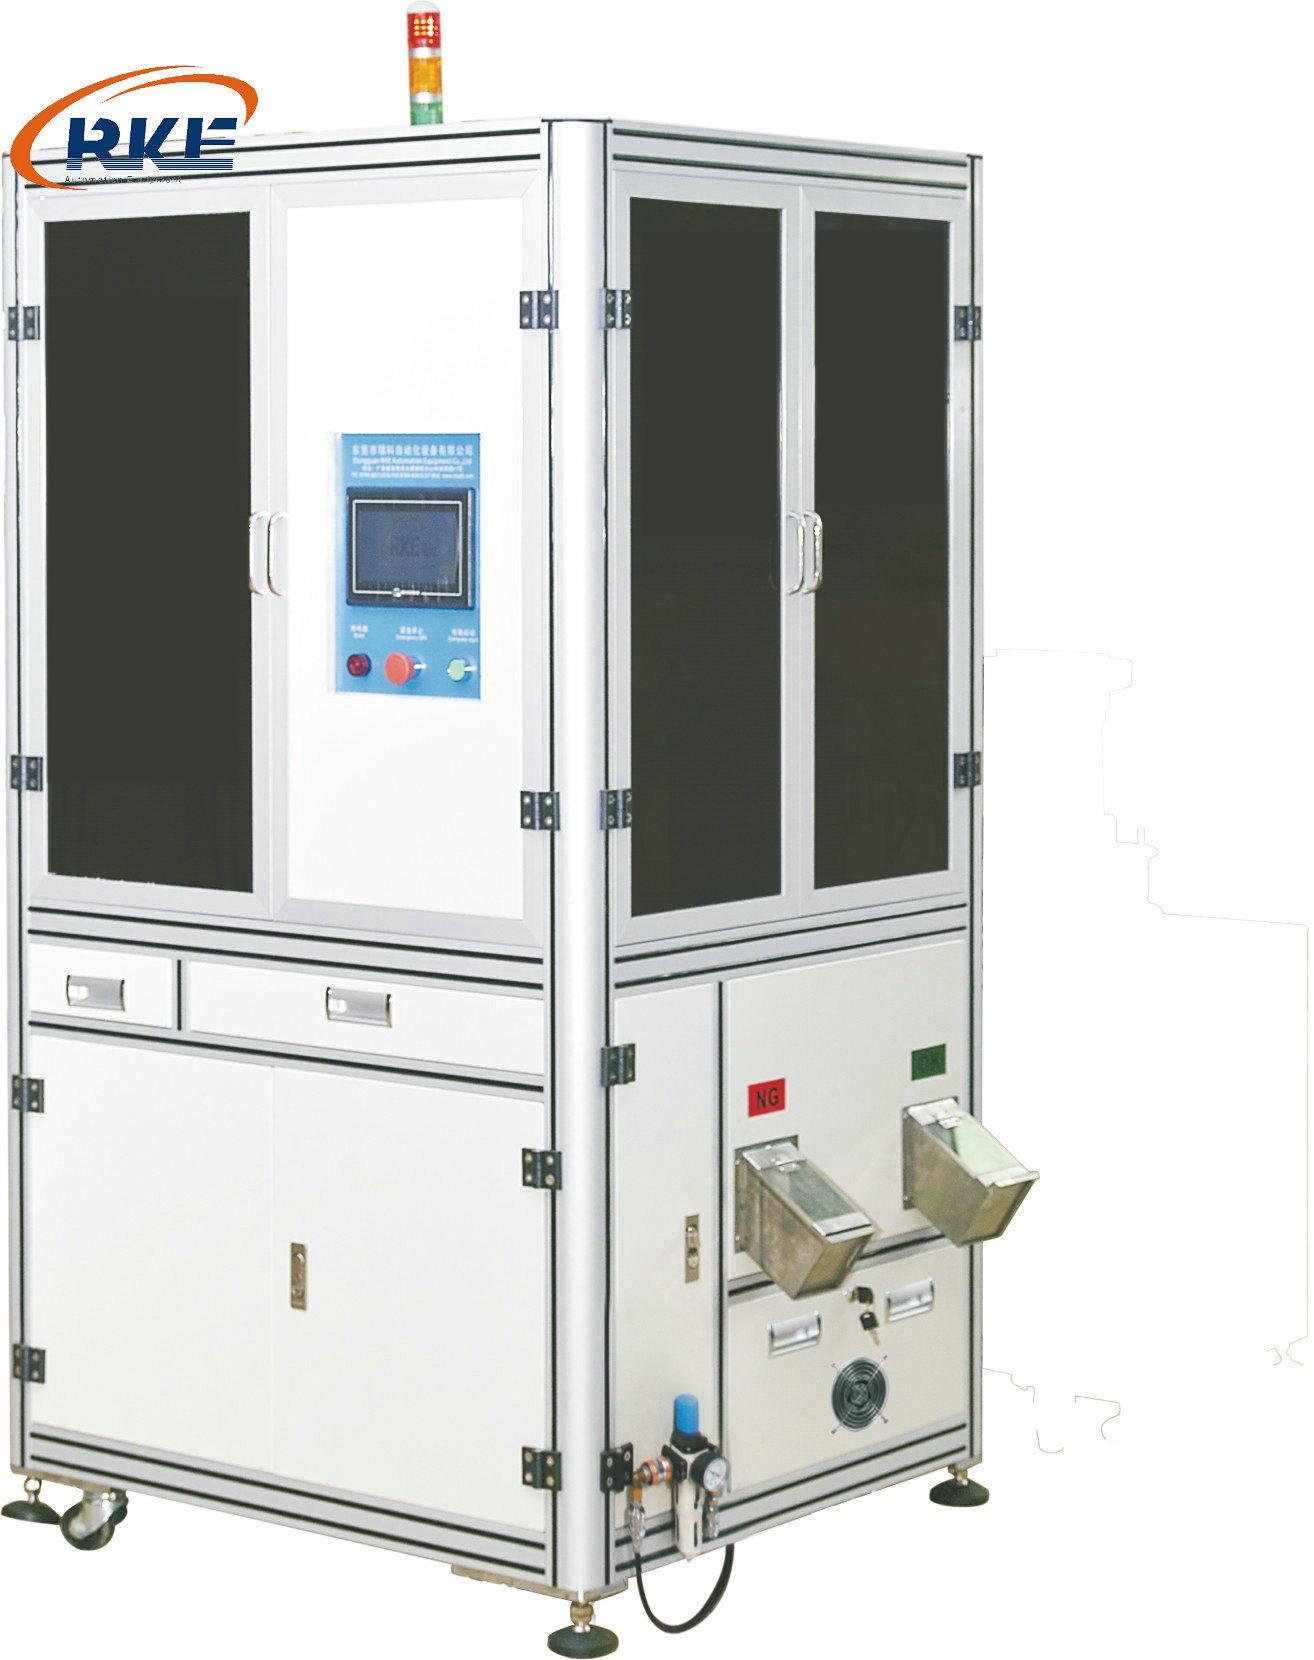 Automatic Bolt Optical Sorting Machine